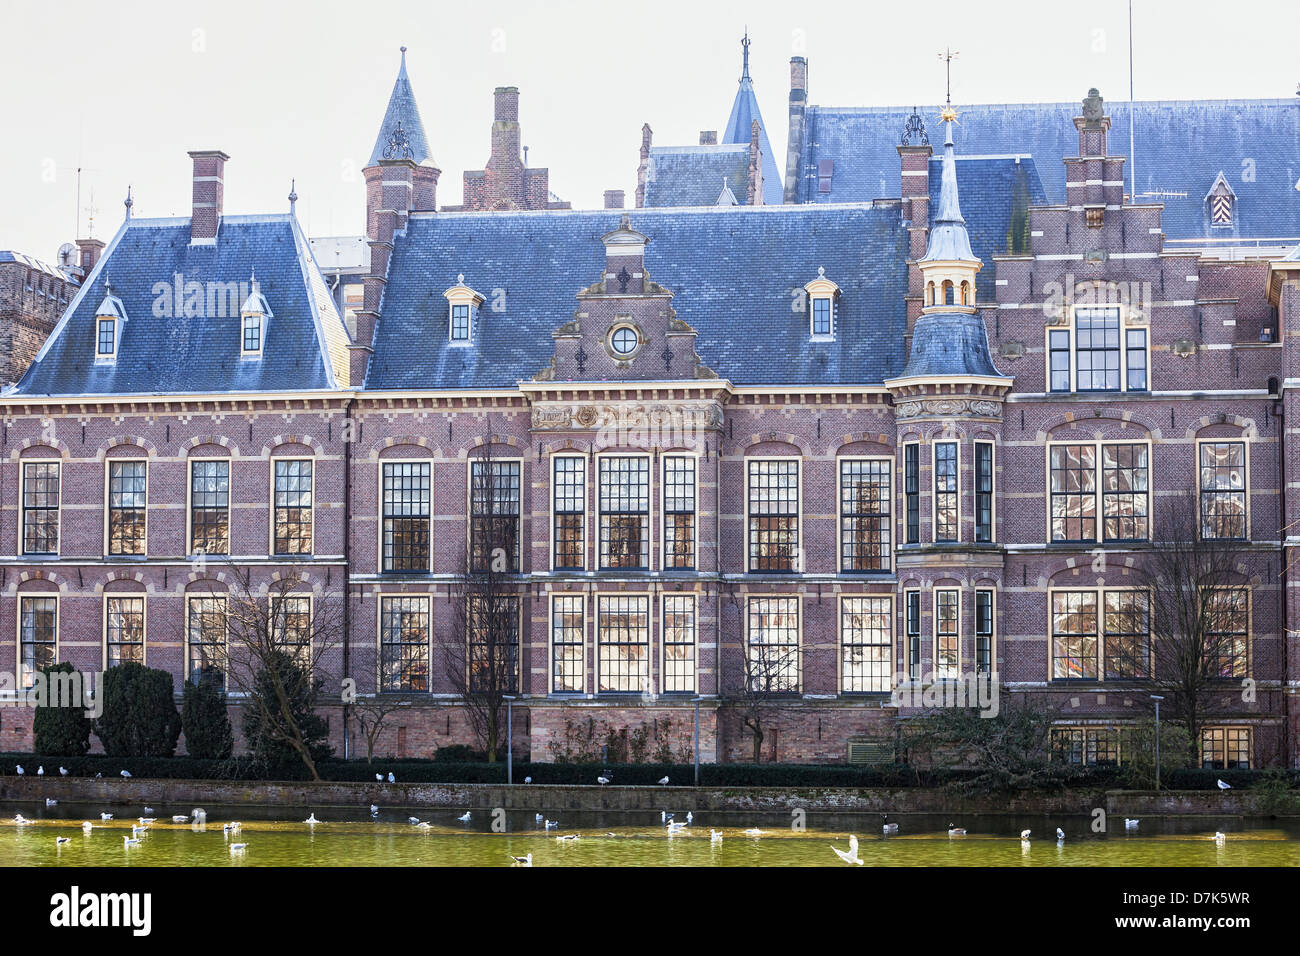 Benelux Parliament